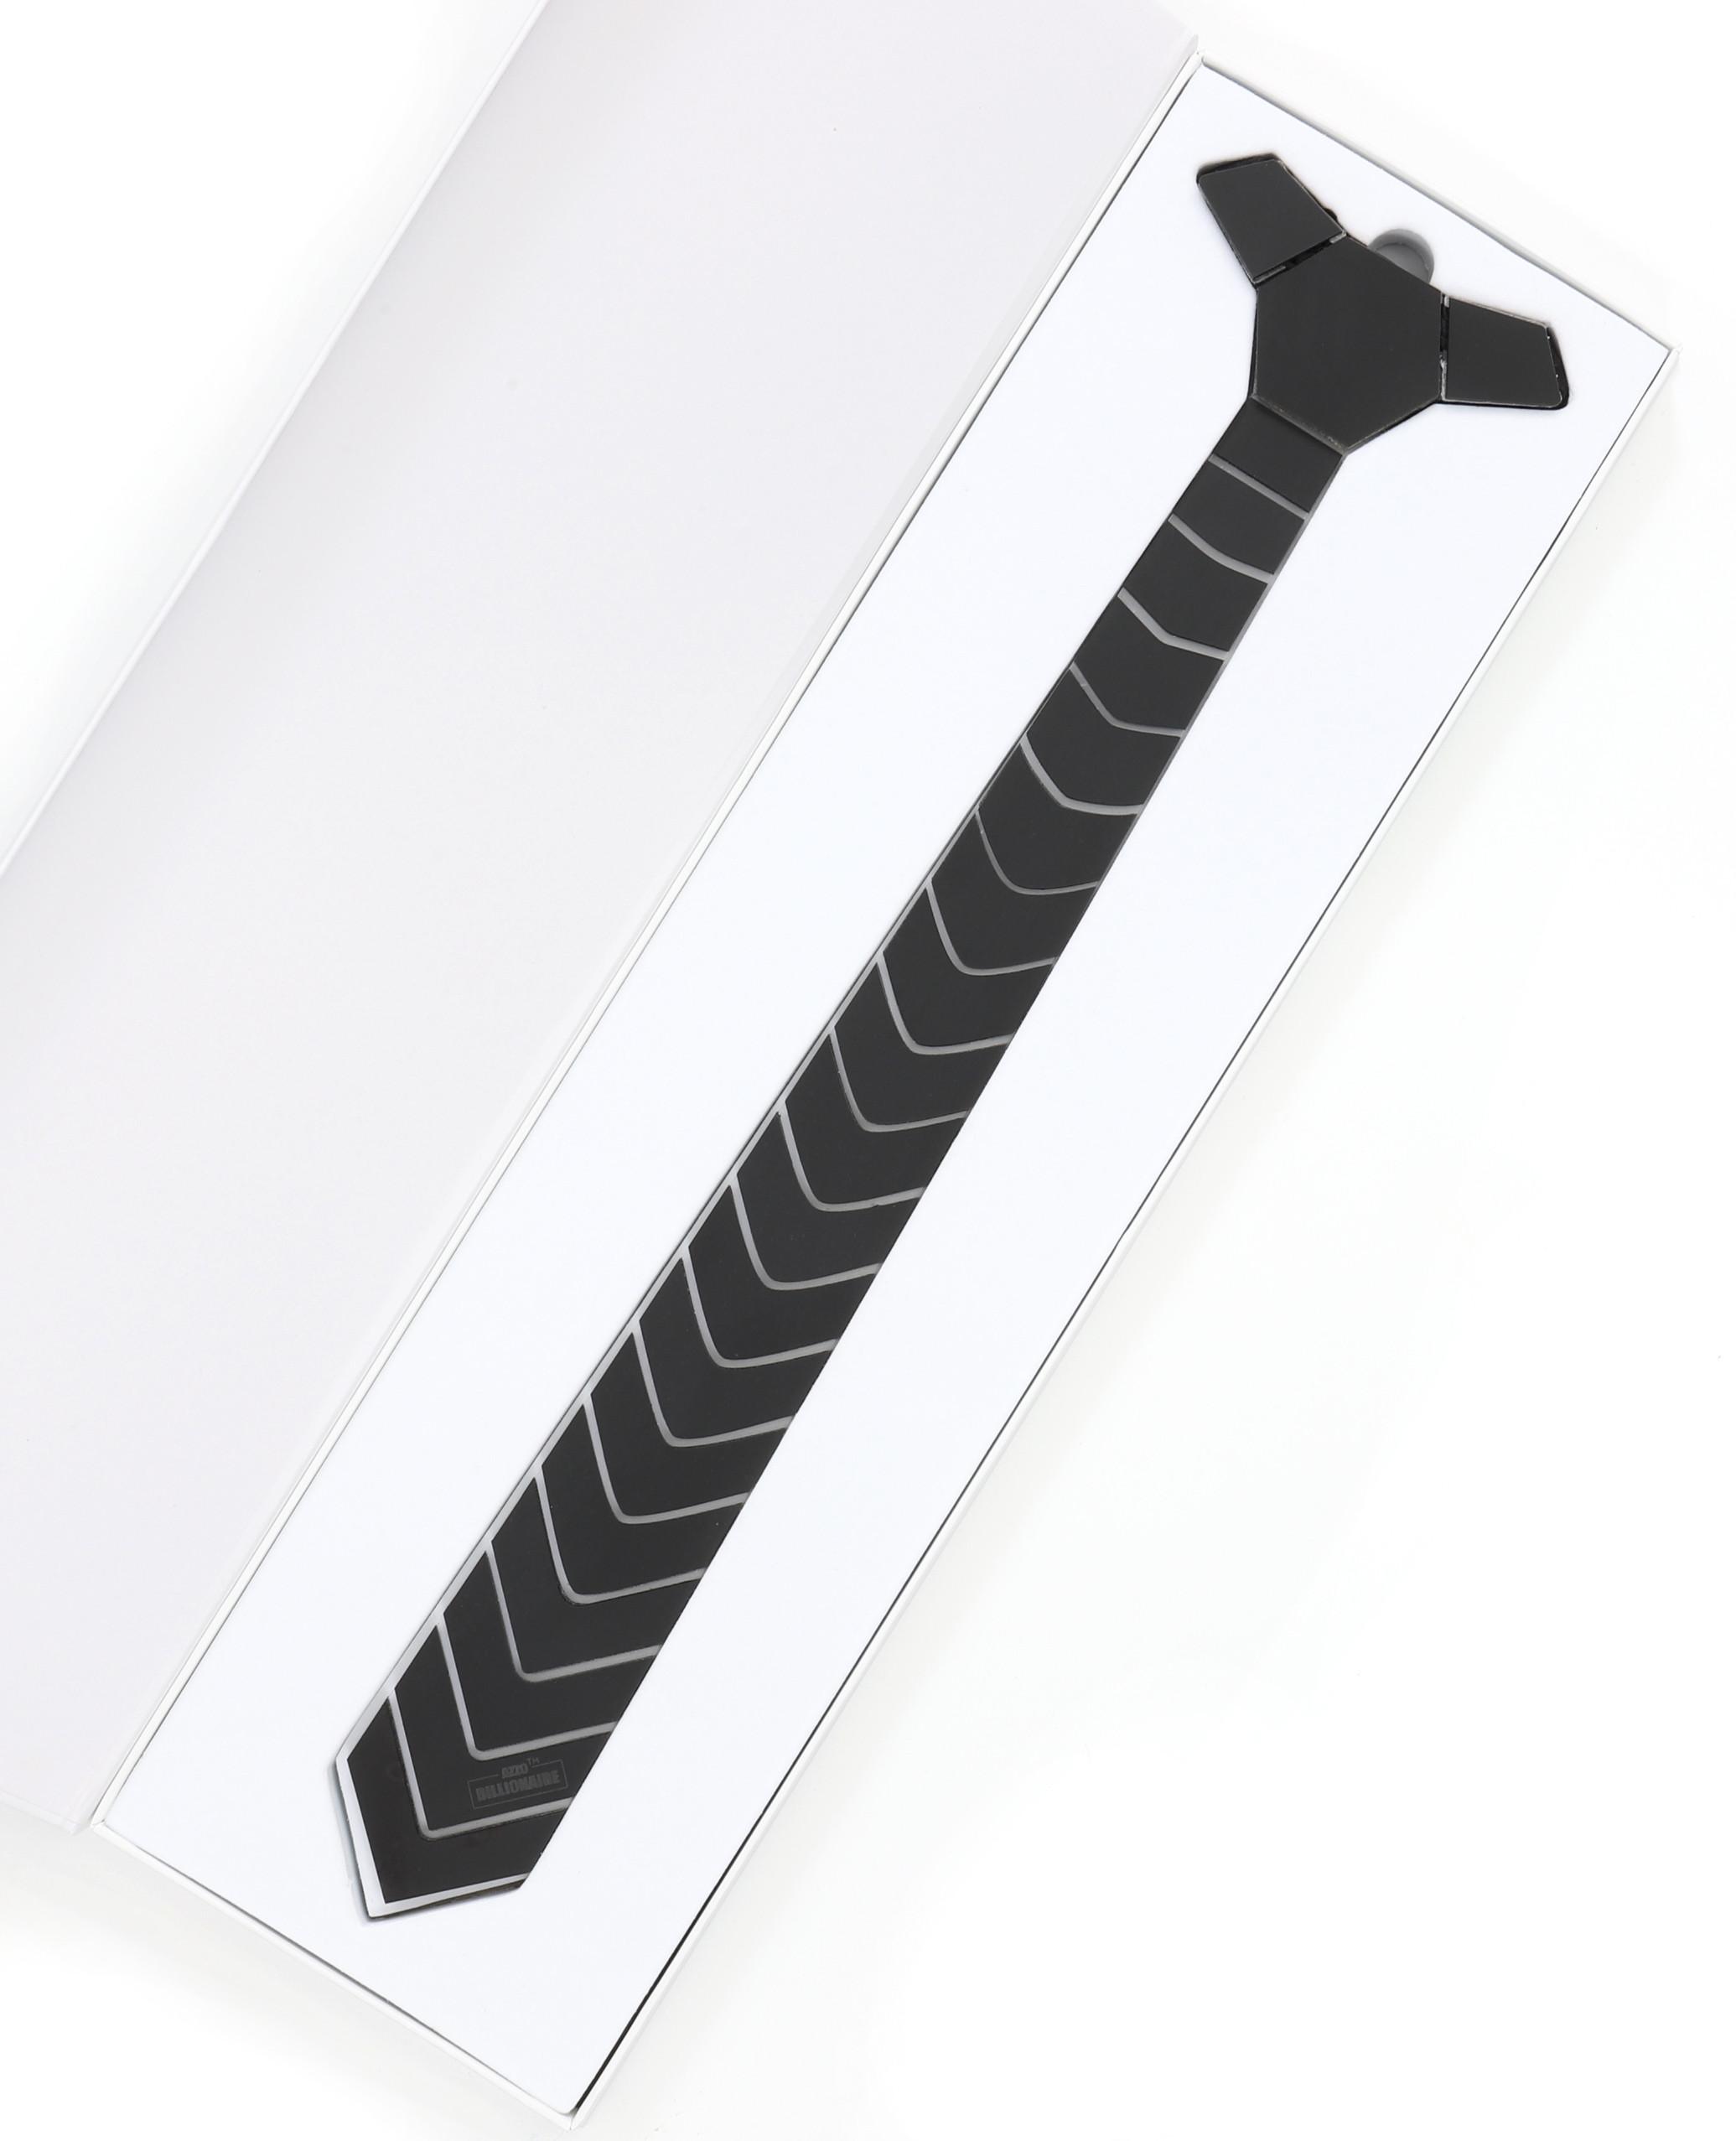 Kravata Black Arrow-182092-31